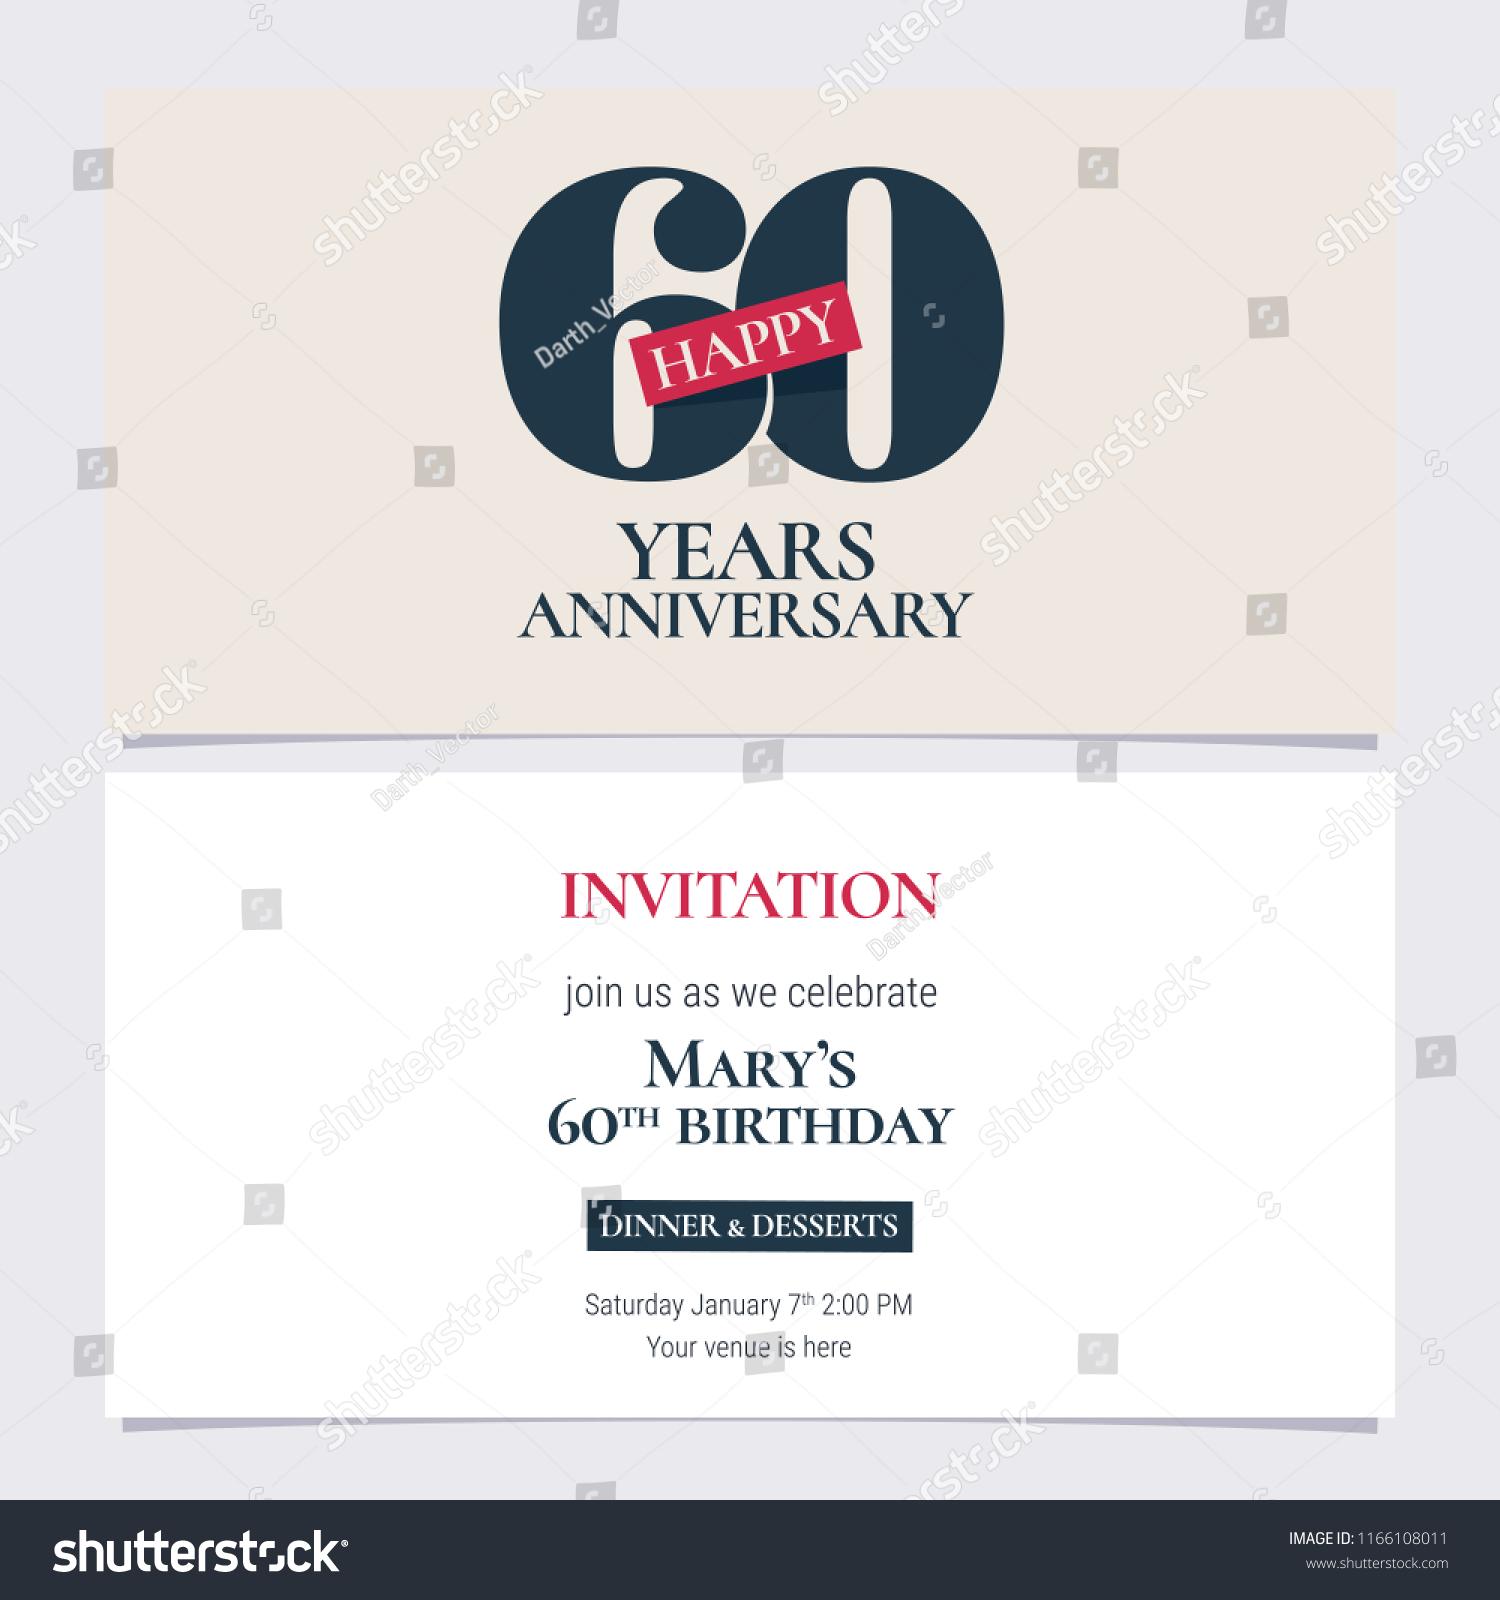 60 years anniversary invitation vector illustration stock vector